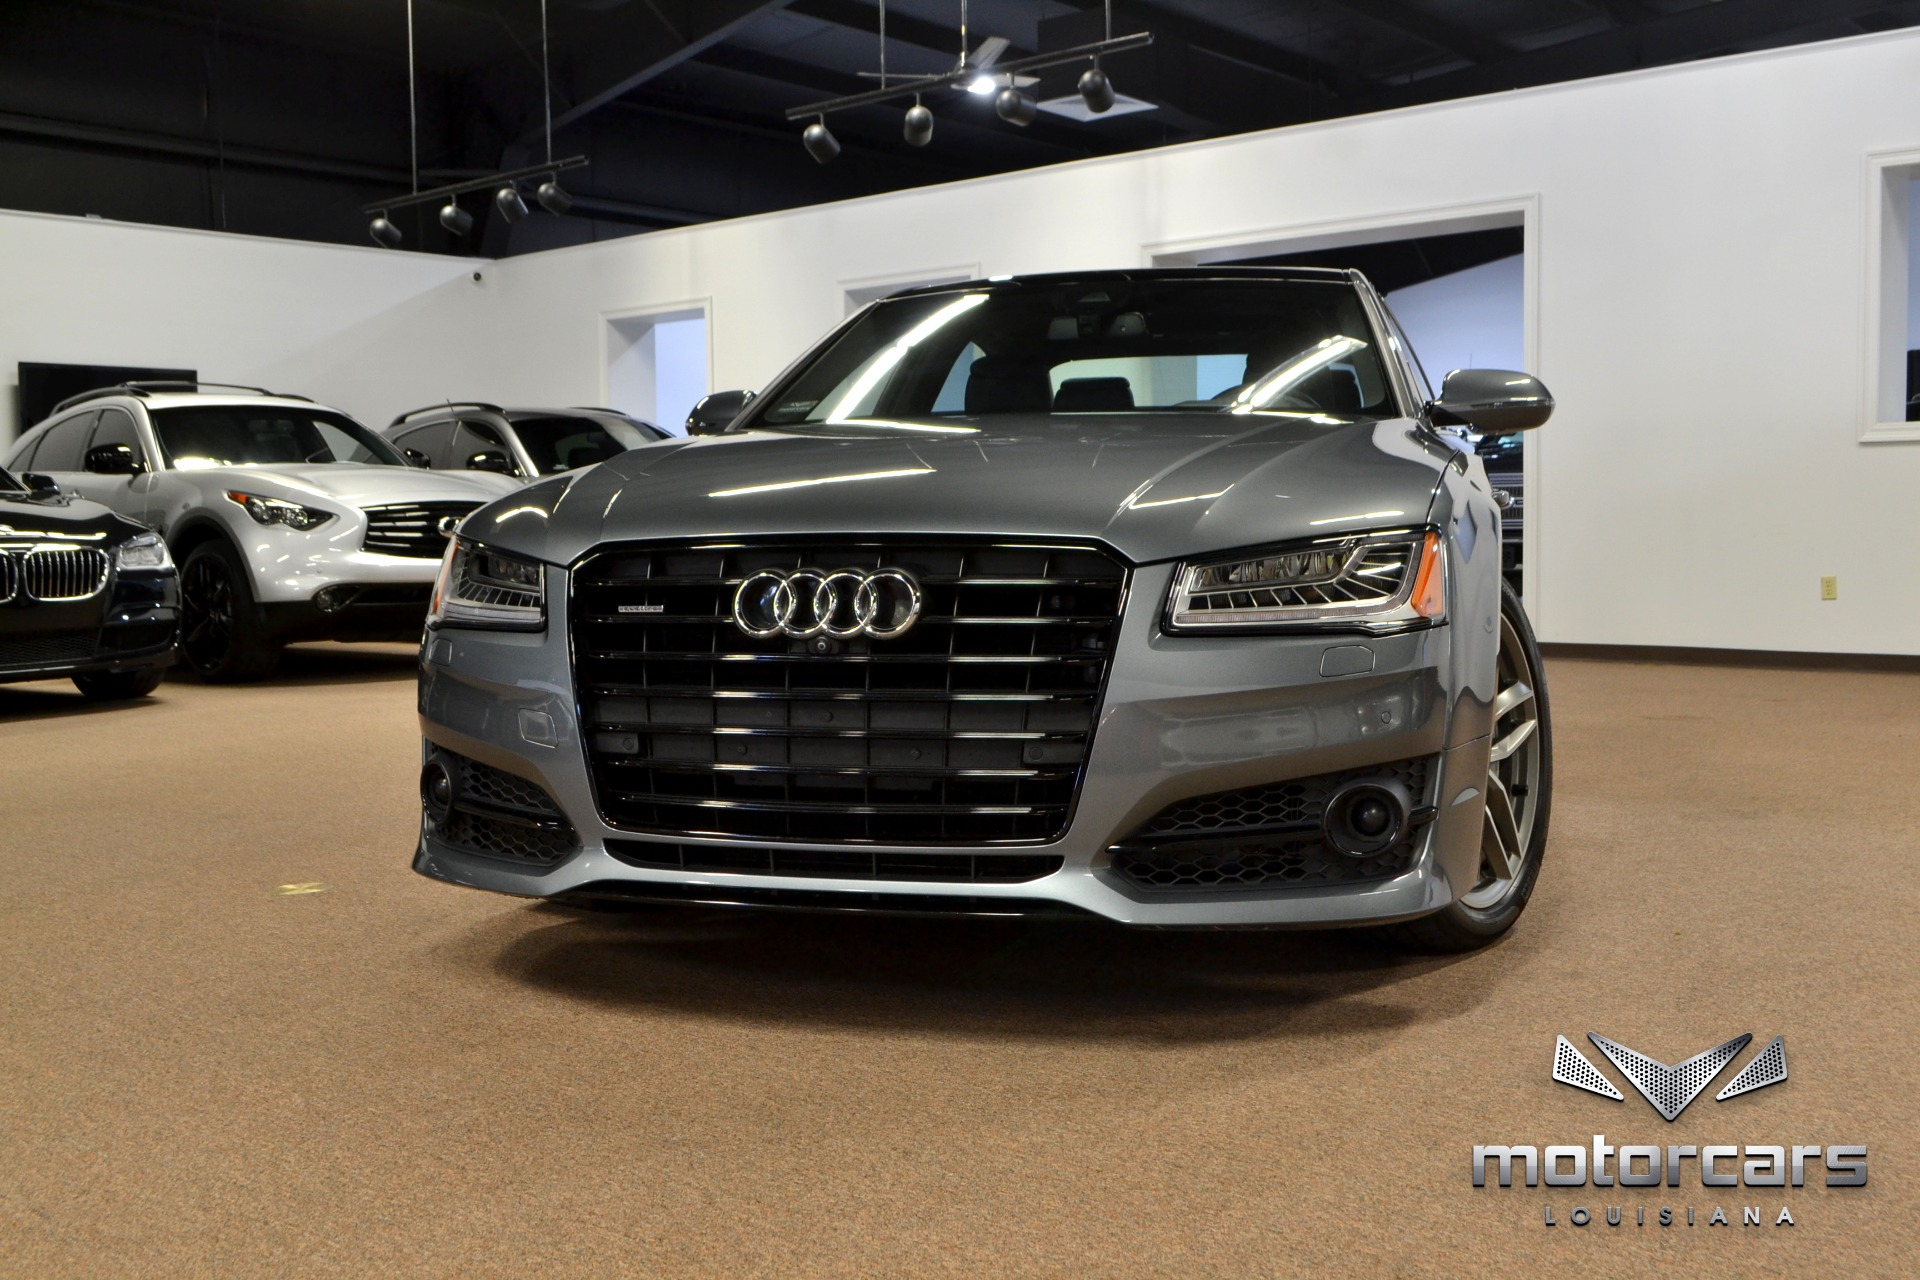 Kekurangan Audi A8 2017 Tangguh